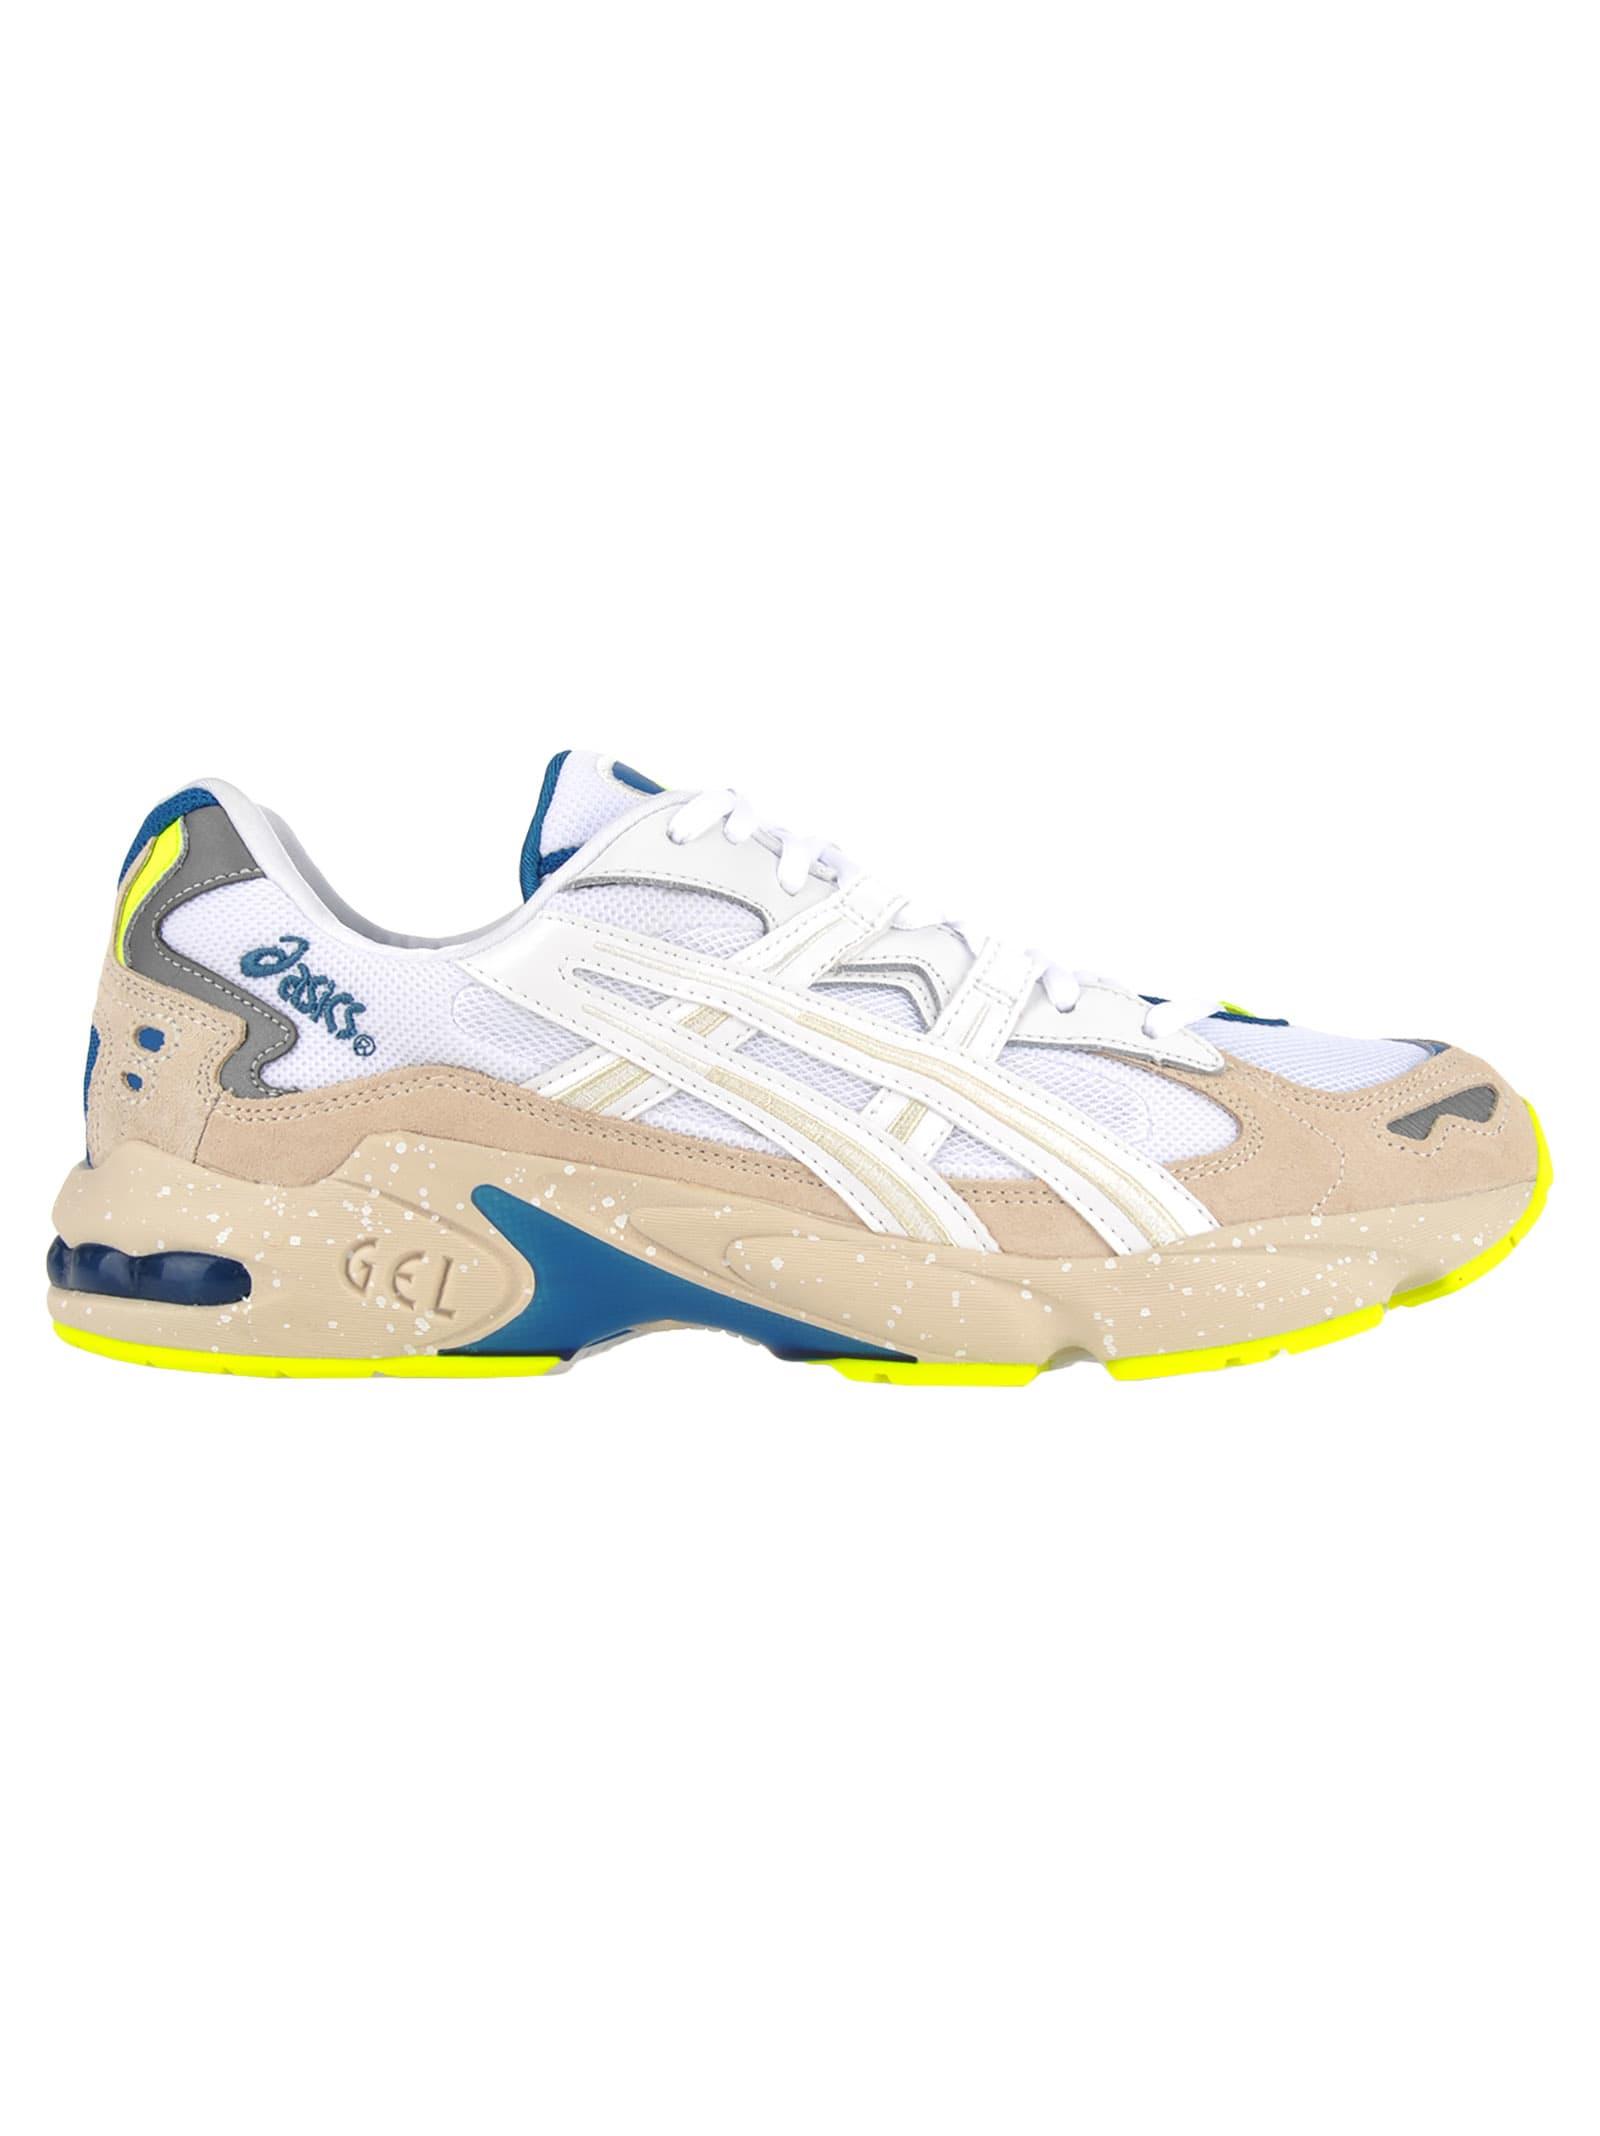 promo code c2948 6a808 Asics Gel Kayano 5 Og Sneakers